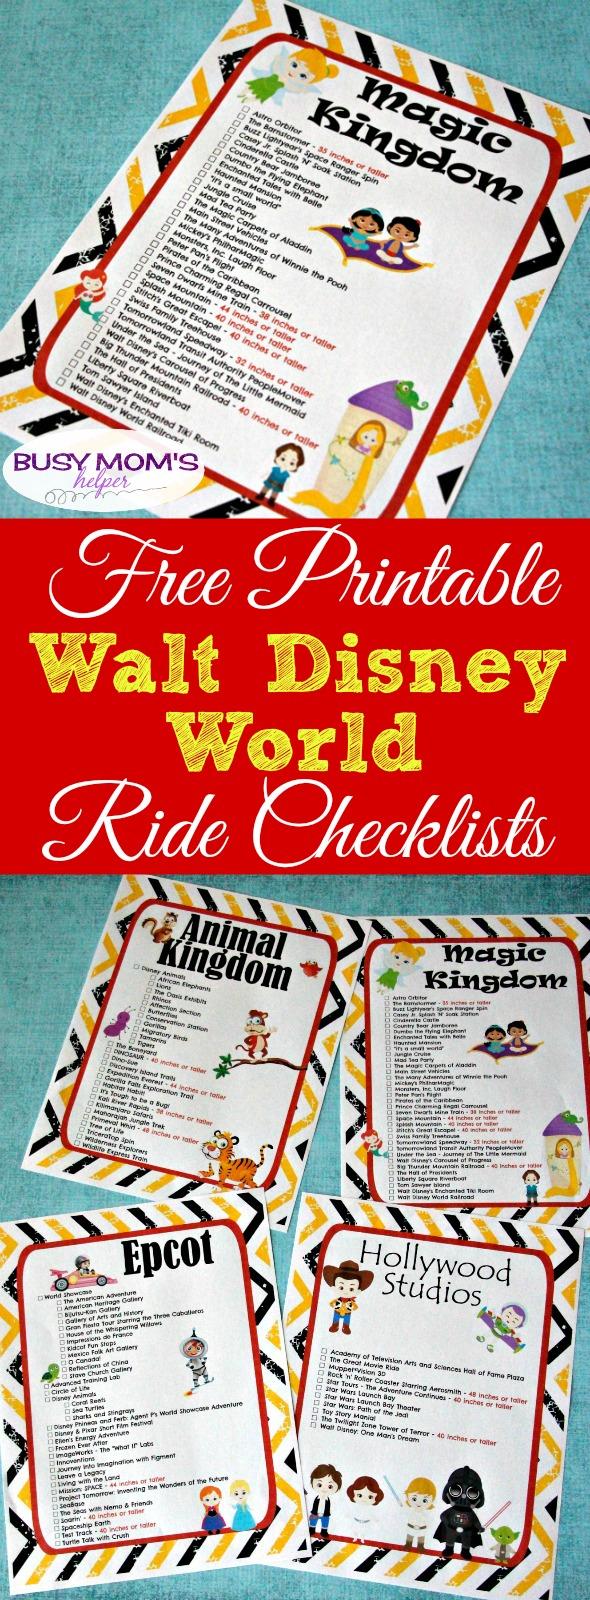 Free Printable Walt Disney World Ride Checklists - Busy Moms